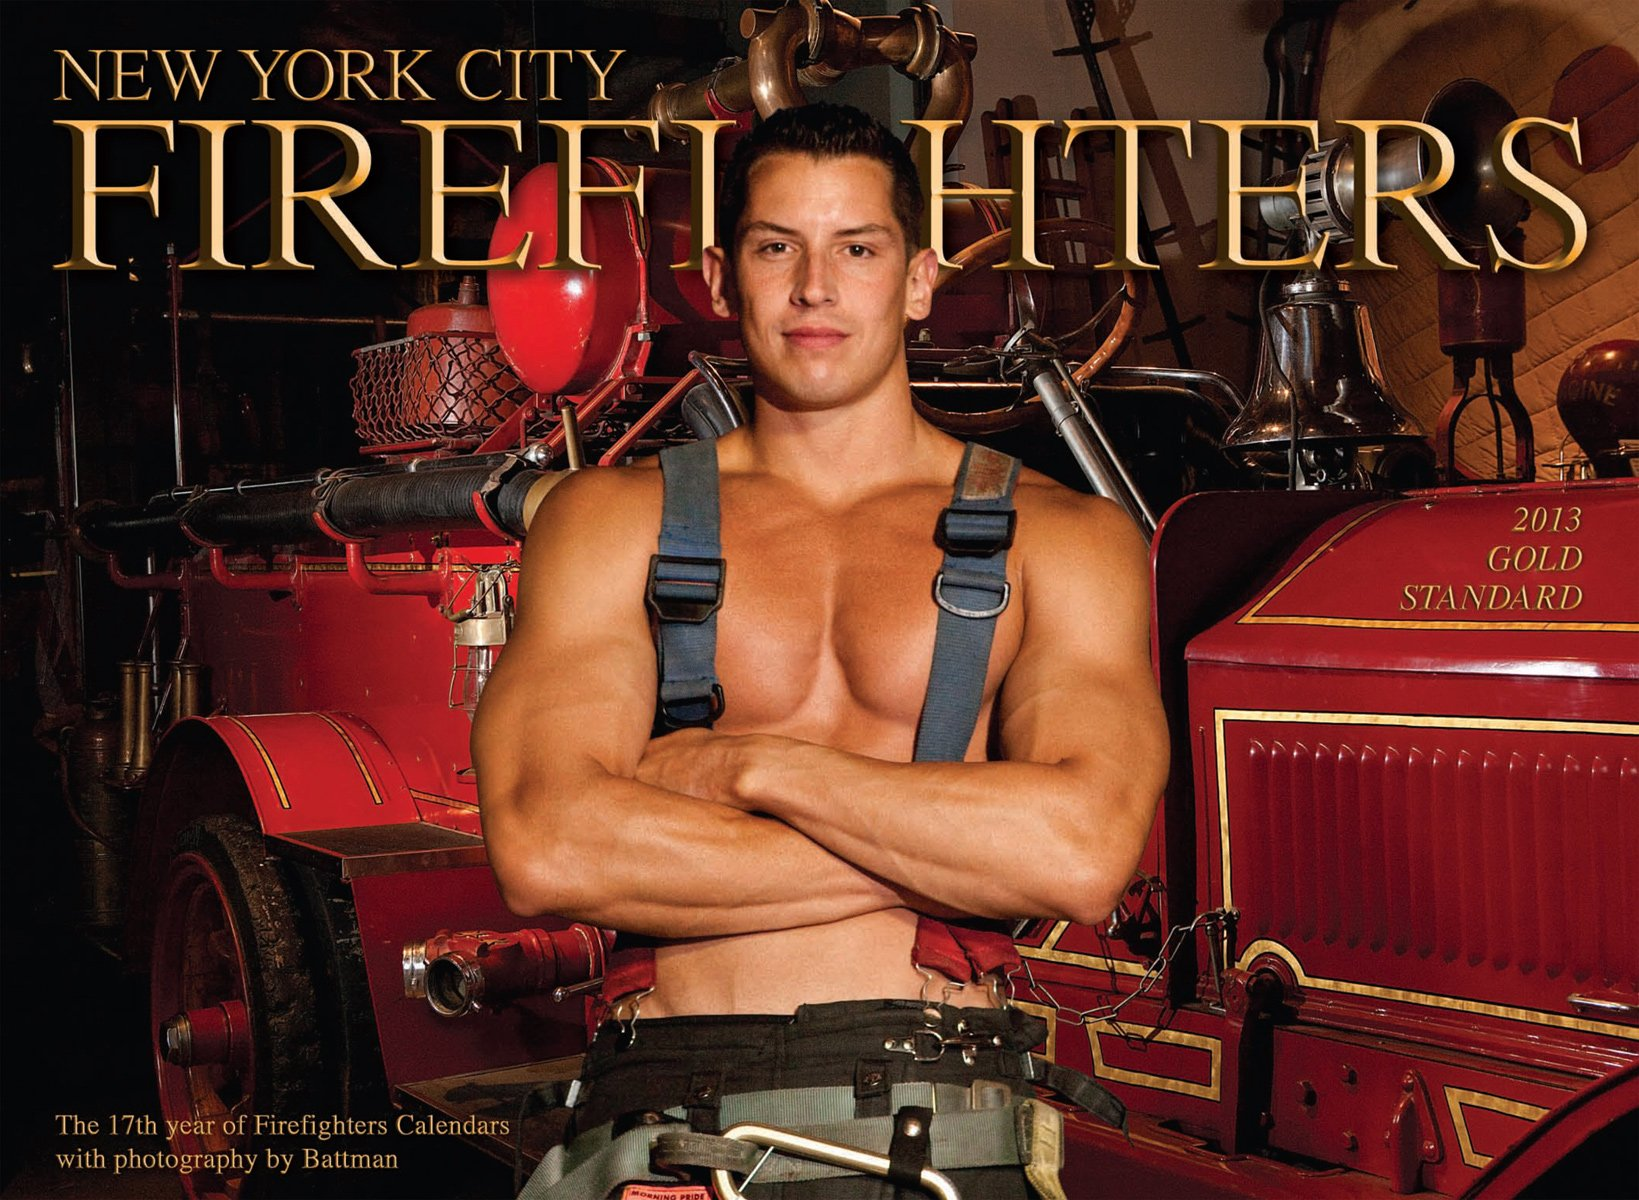 2013 New York City Firefighters Calendar ebook